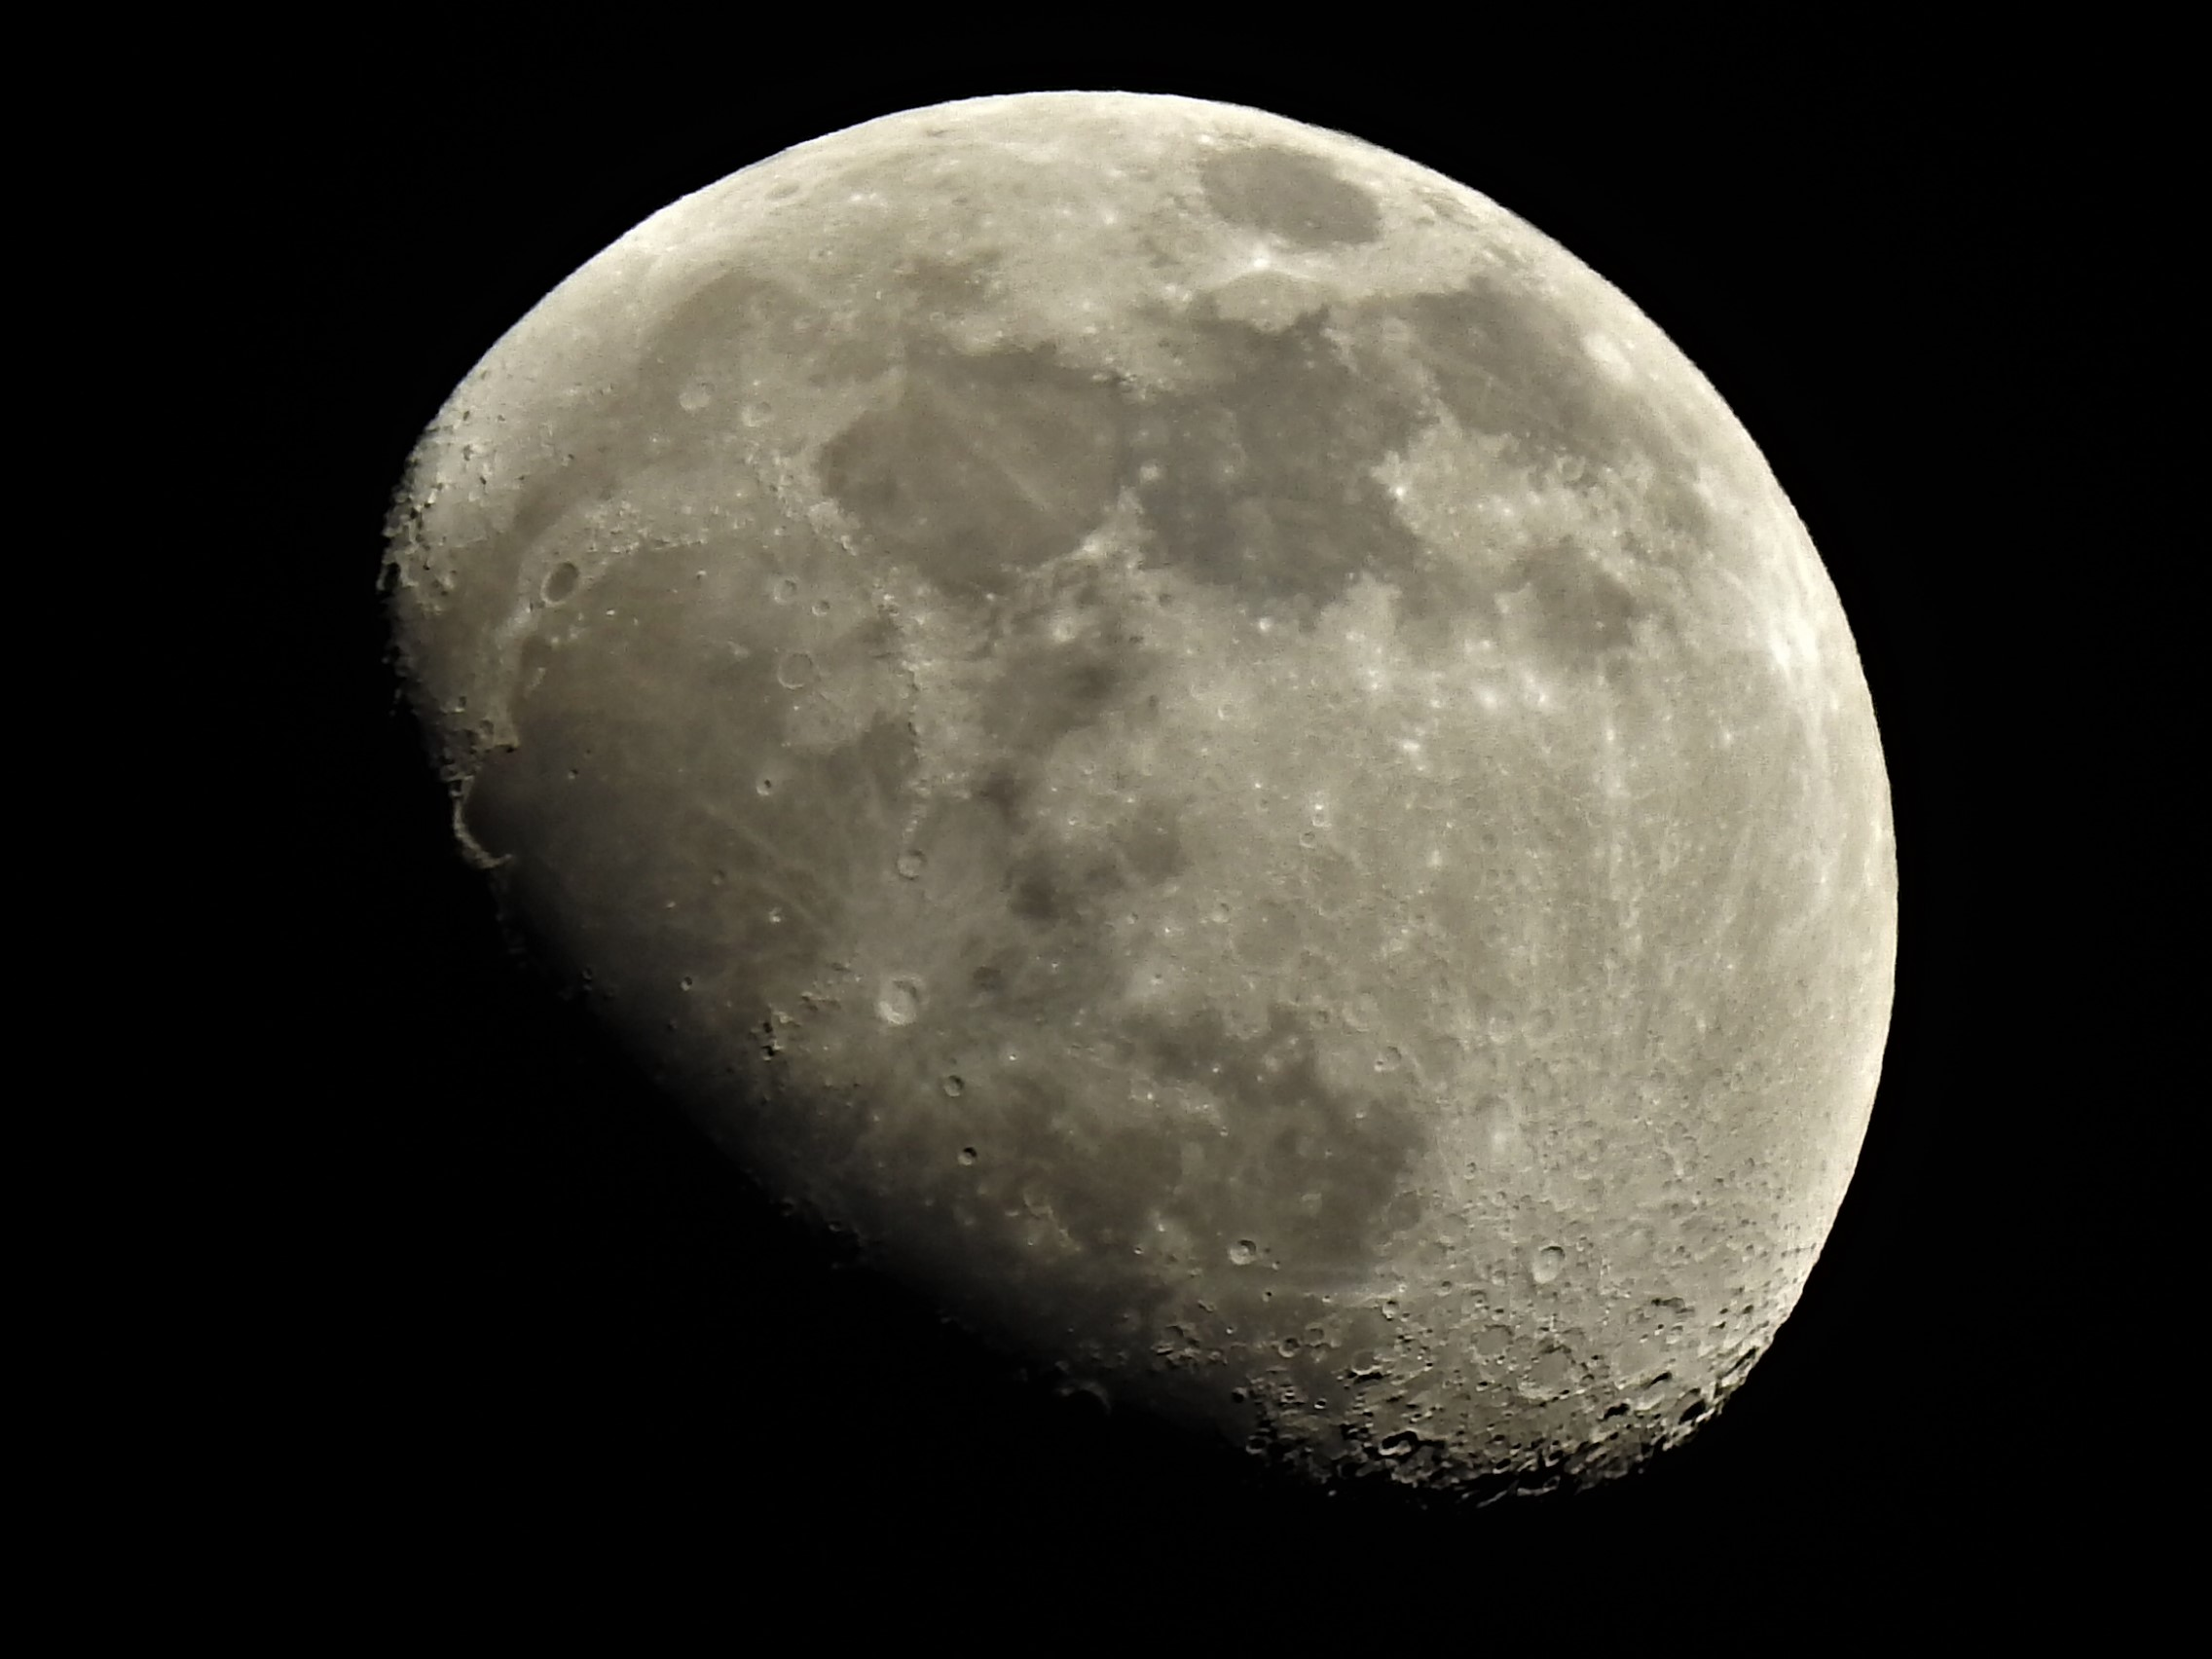 La Luna Hoy 04/02/2020